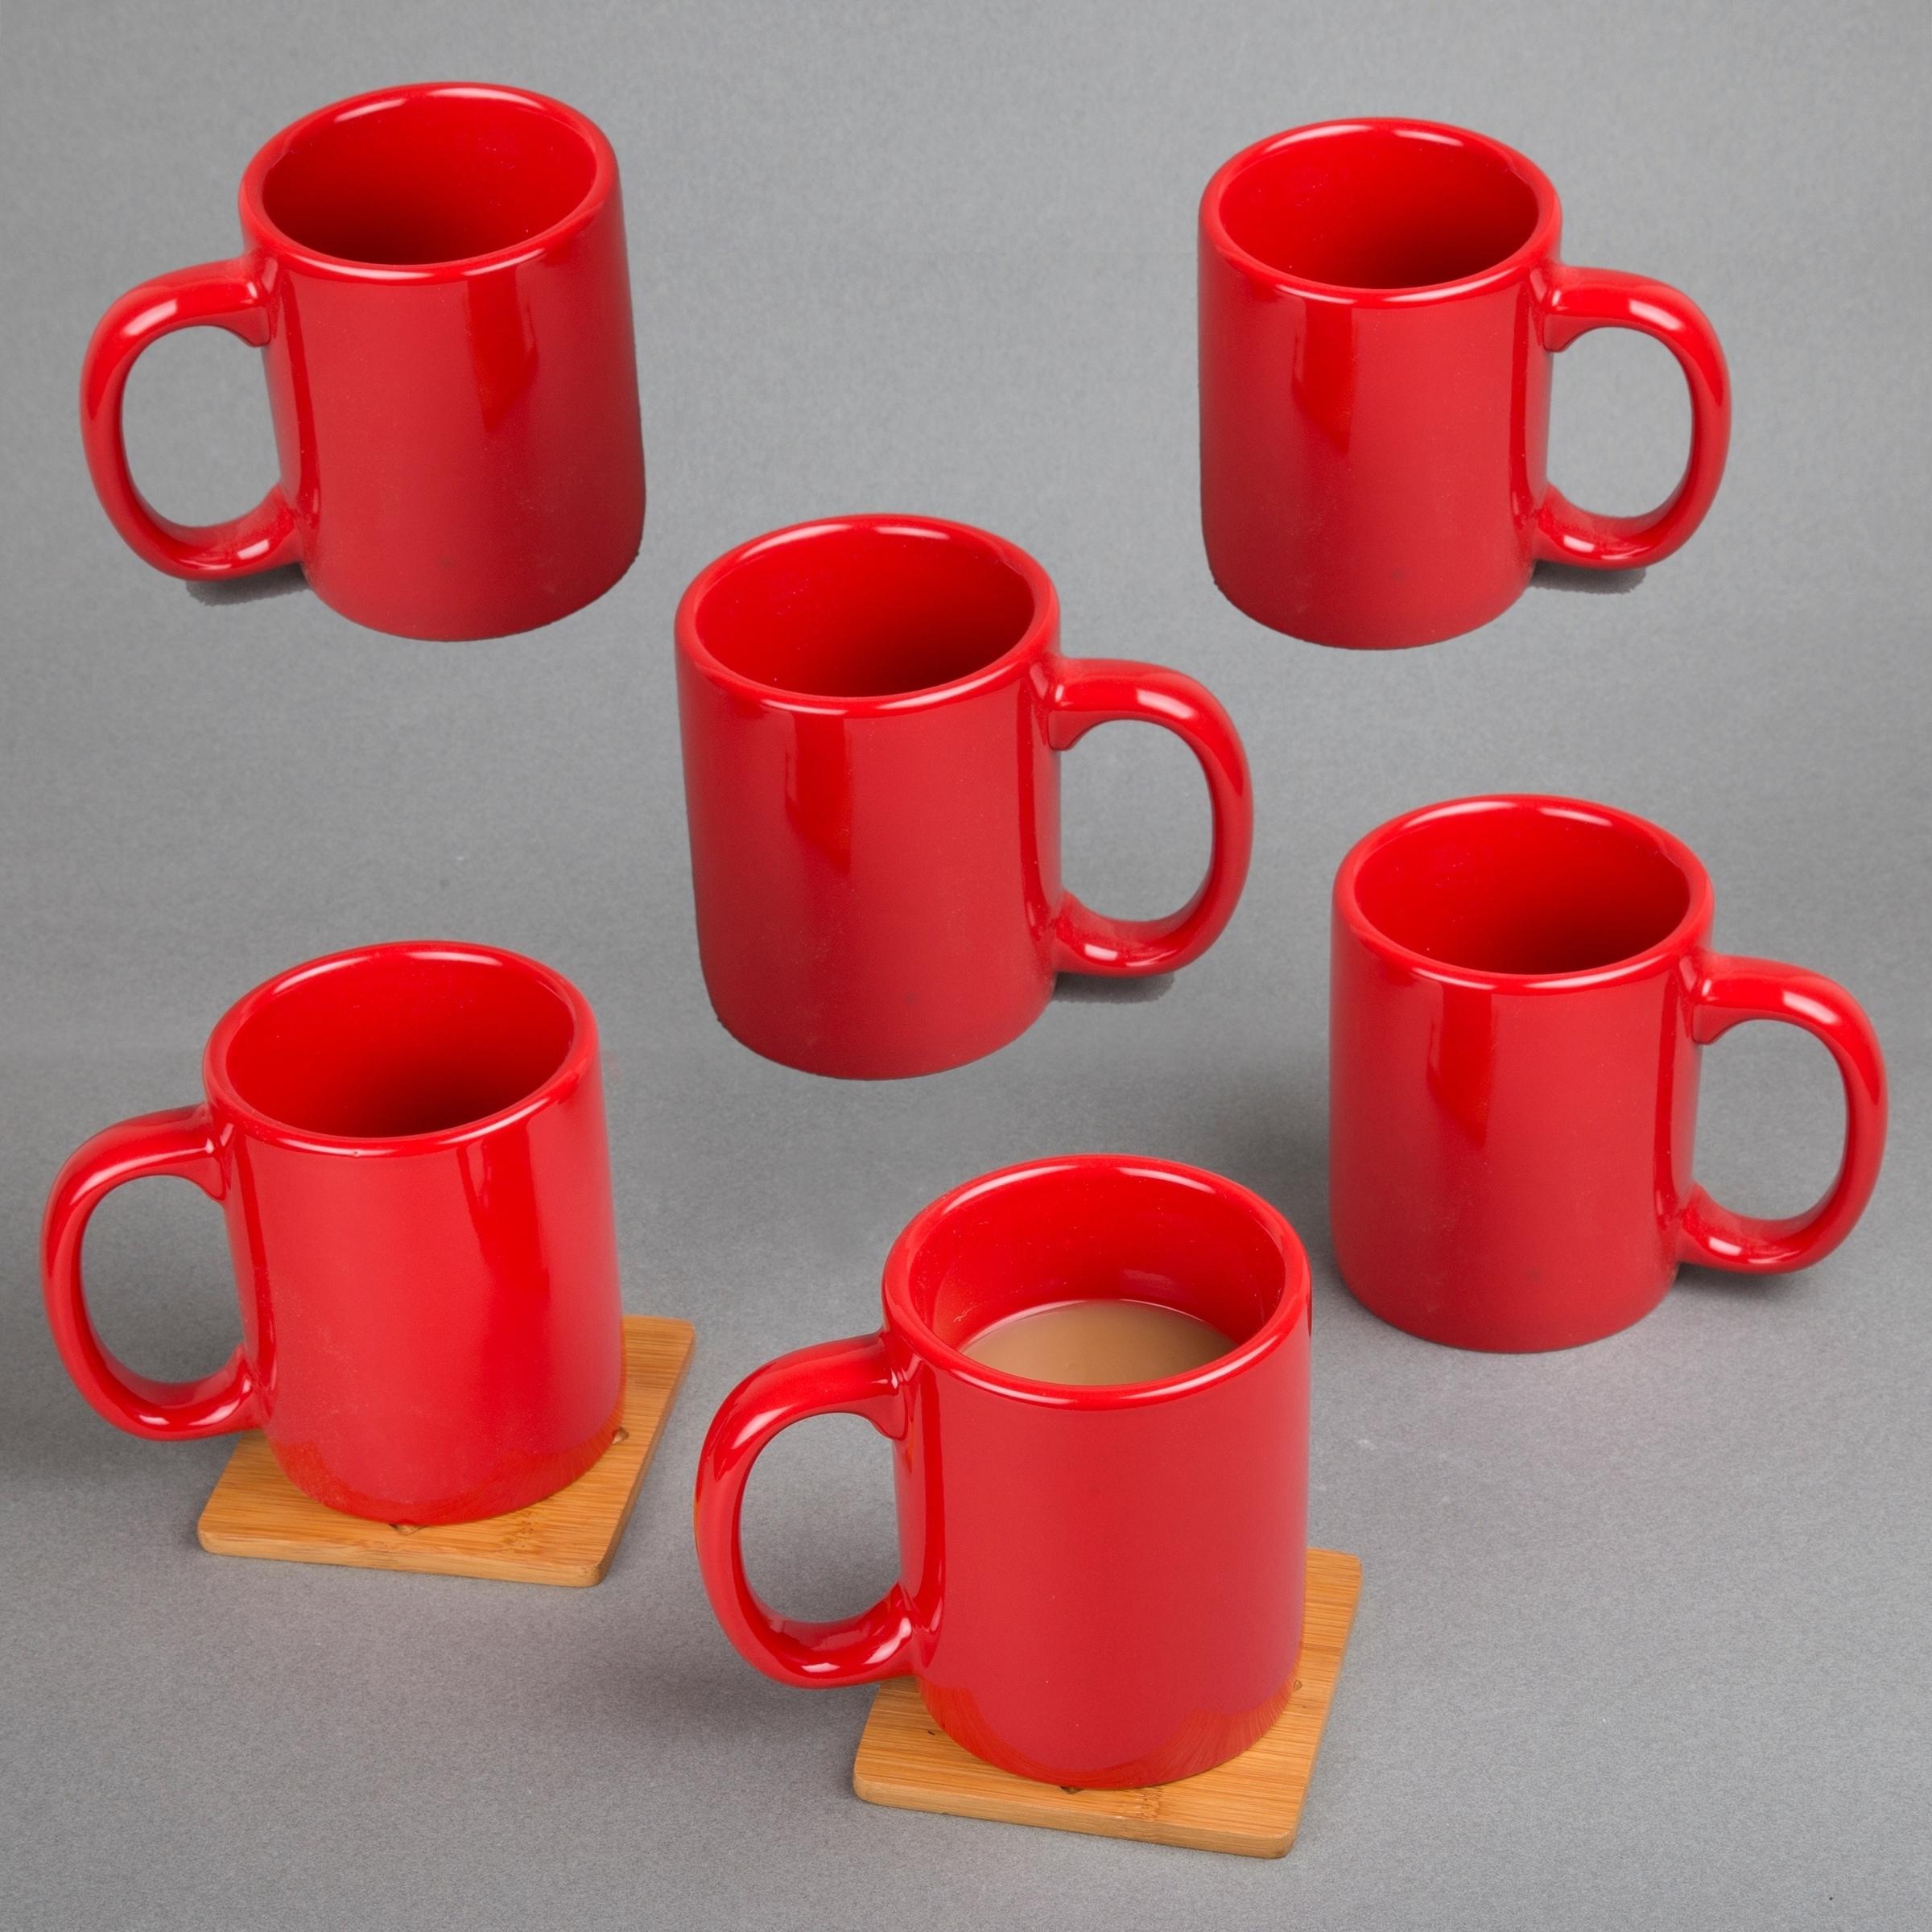 Cocoa Mug Tea Cup White /& Red Mugs Set of 6 Coffee Mug Set of 6 Mugs